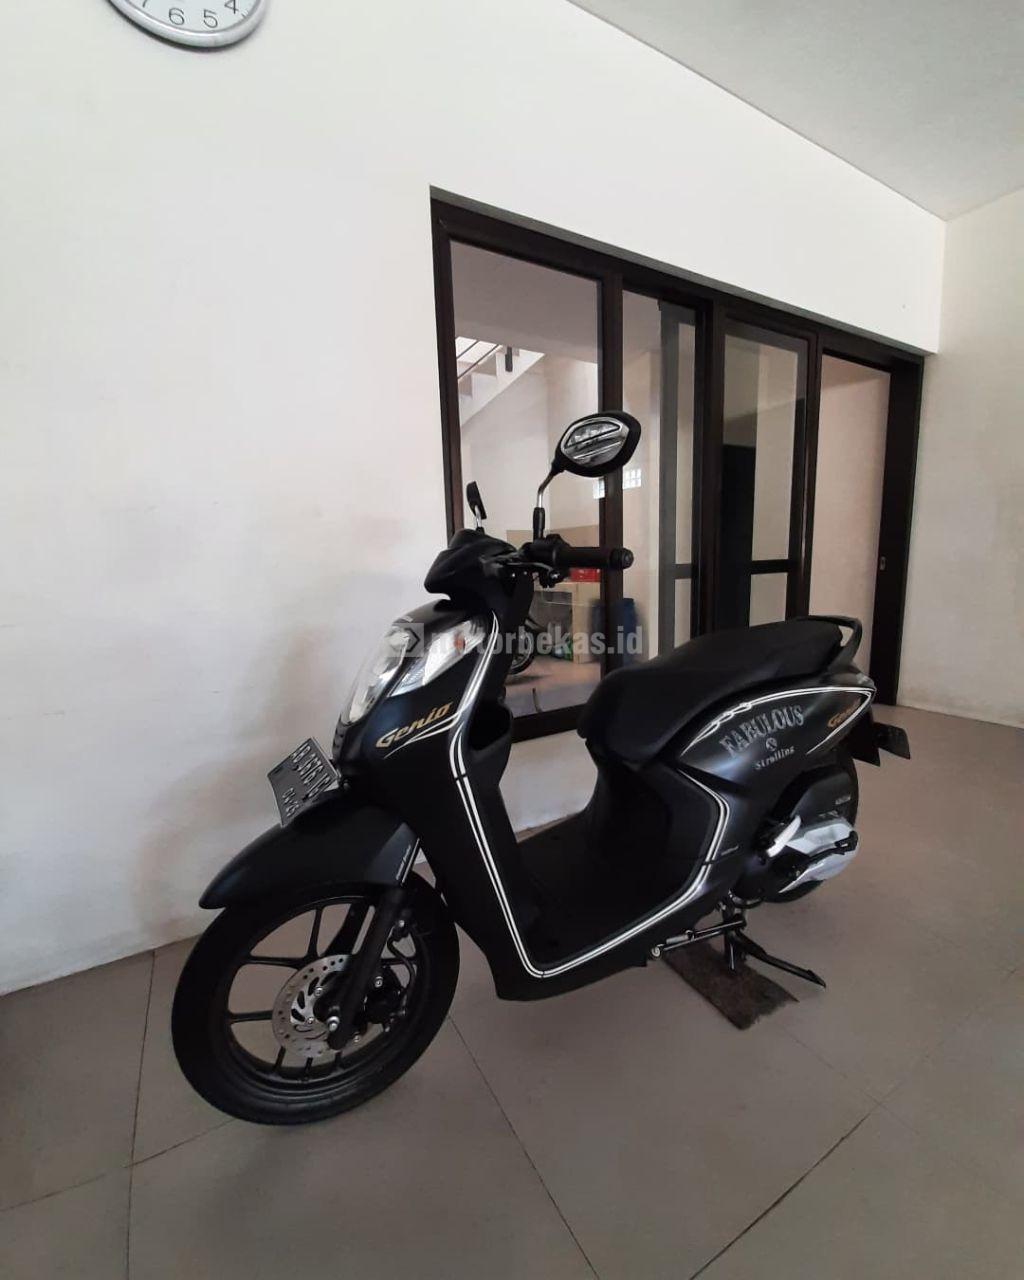 HONDA GENIO  3711 motorbekas.id